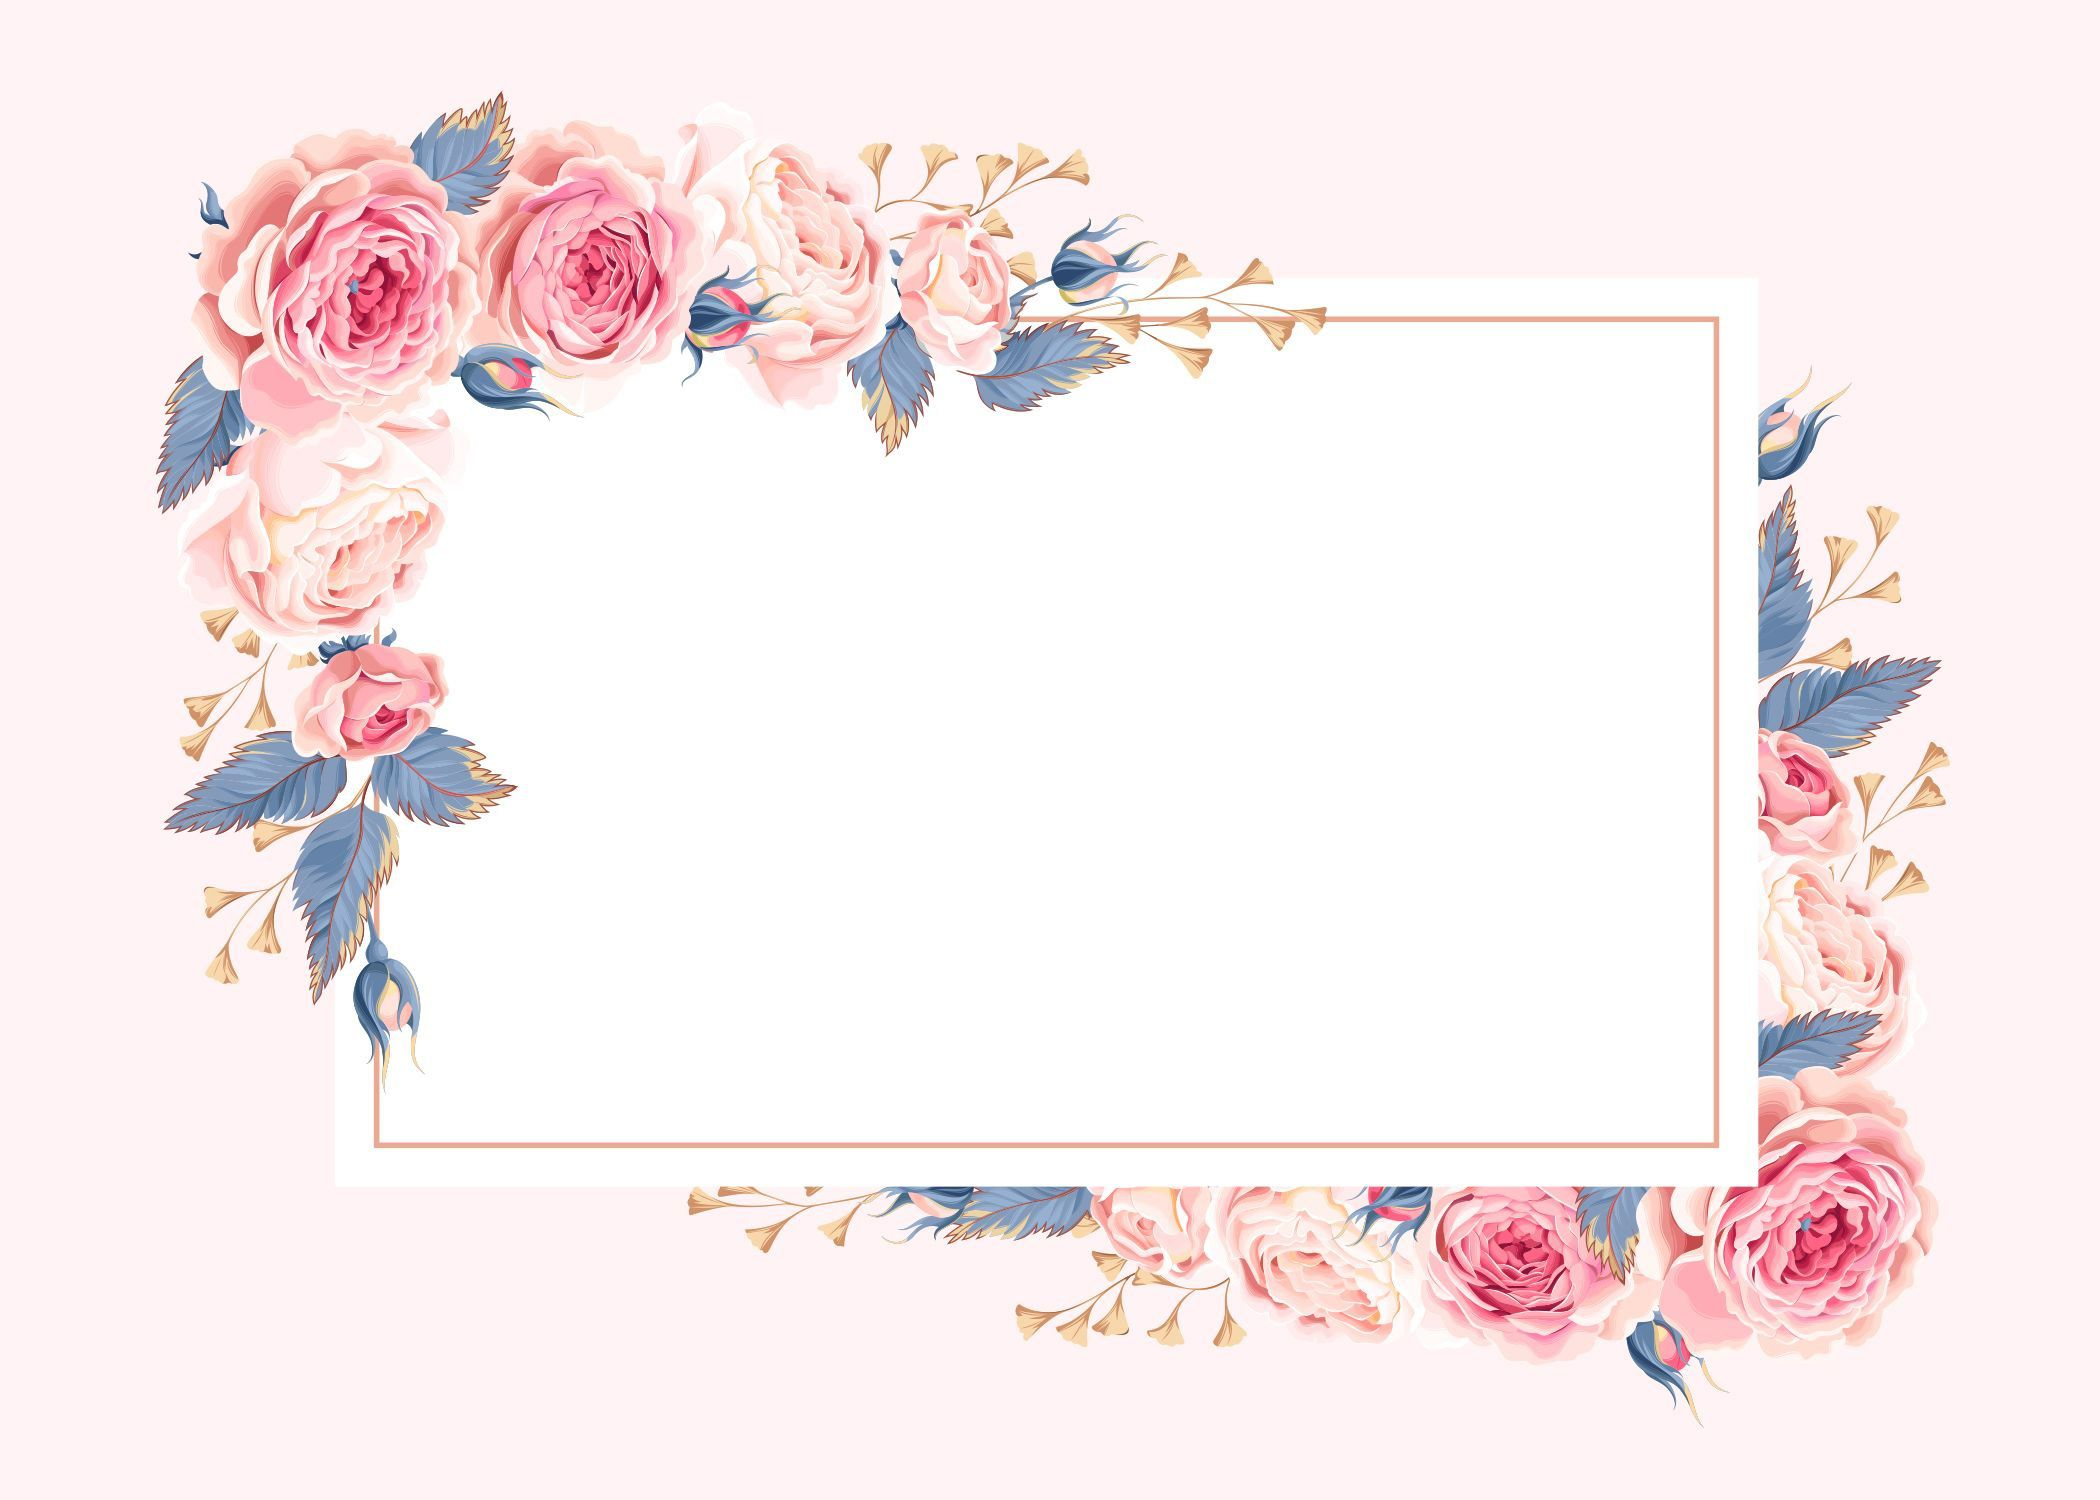 005 Breathtaking Printable Greeting Card Template Design  Templates Print Free BirthdayFull